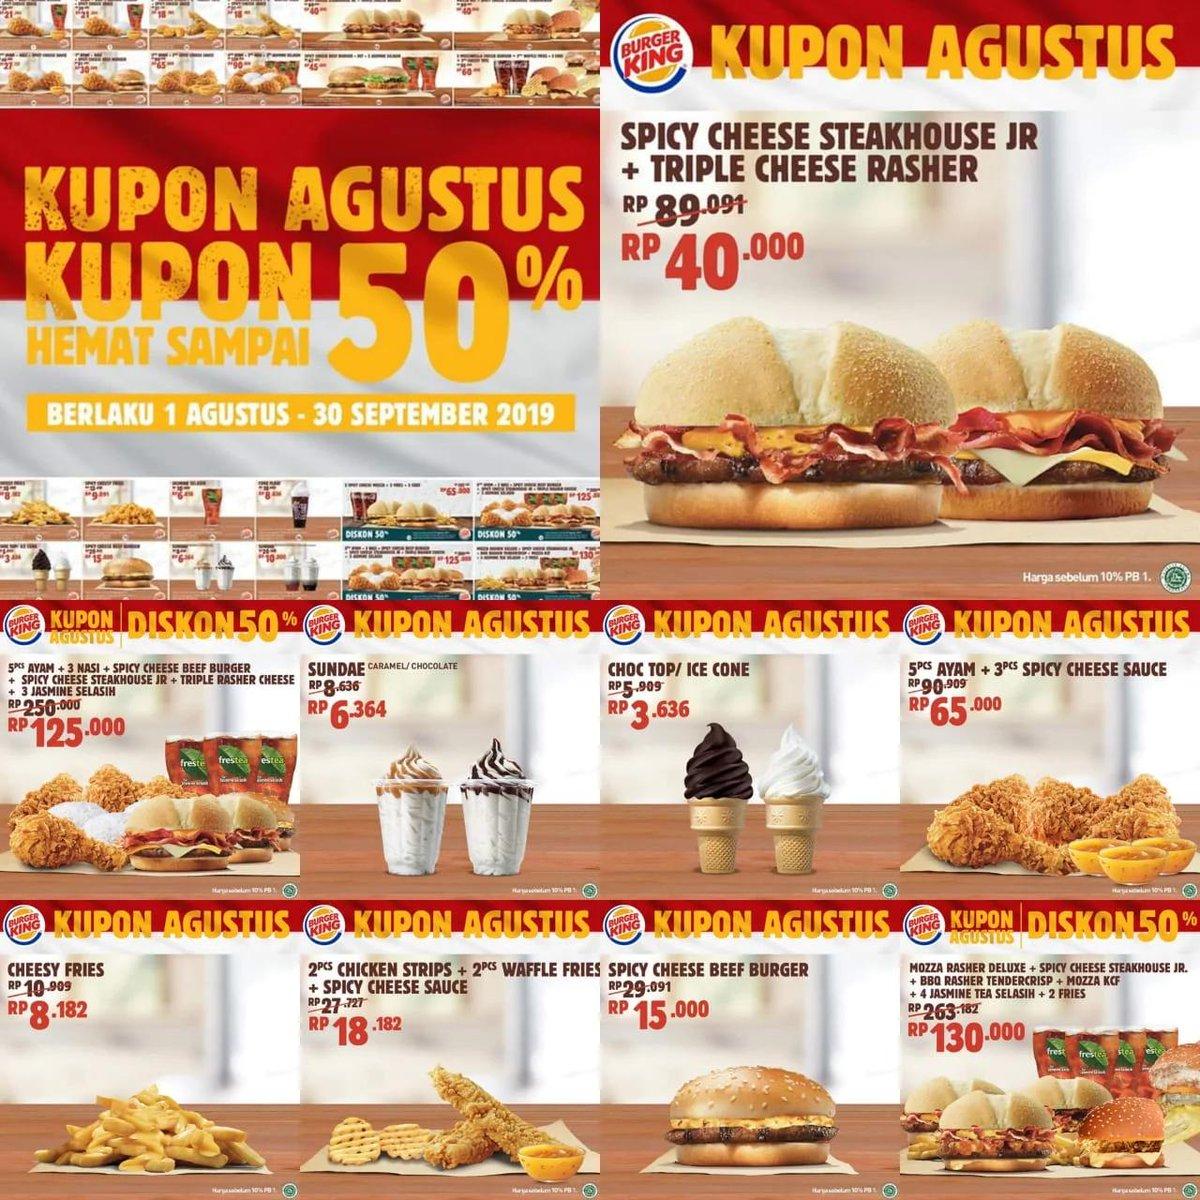 Giladiskon Indonesia على تويتر Burger King Promo Kupon Hemat Bk Diskon Hingga 50 Https T Co G8hikgiuxl Burgerking Promoburgerking Promorestoran Restoran Promomakanan Diskon Promo Promosi Kupondiskon Vouchermakanan Kuponmakanan Burger